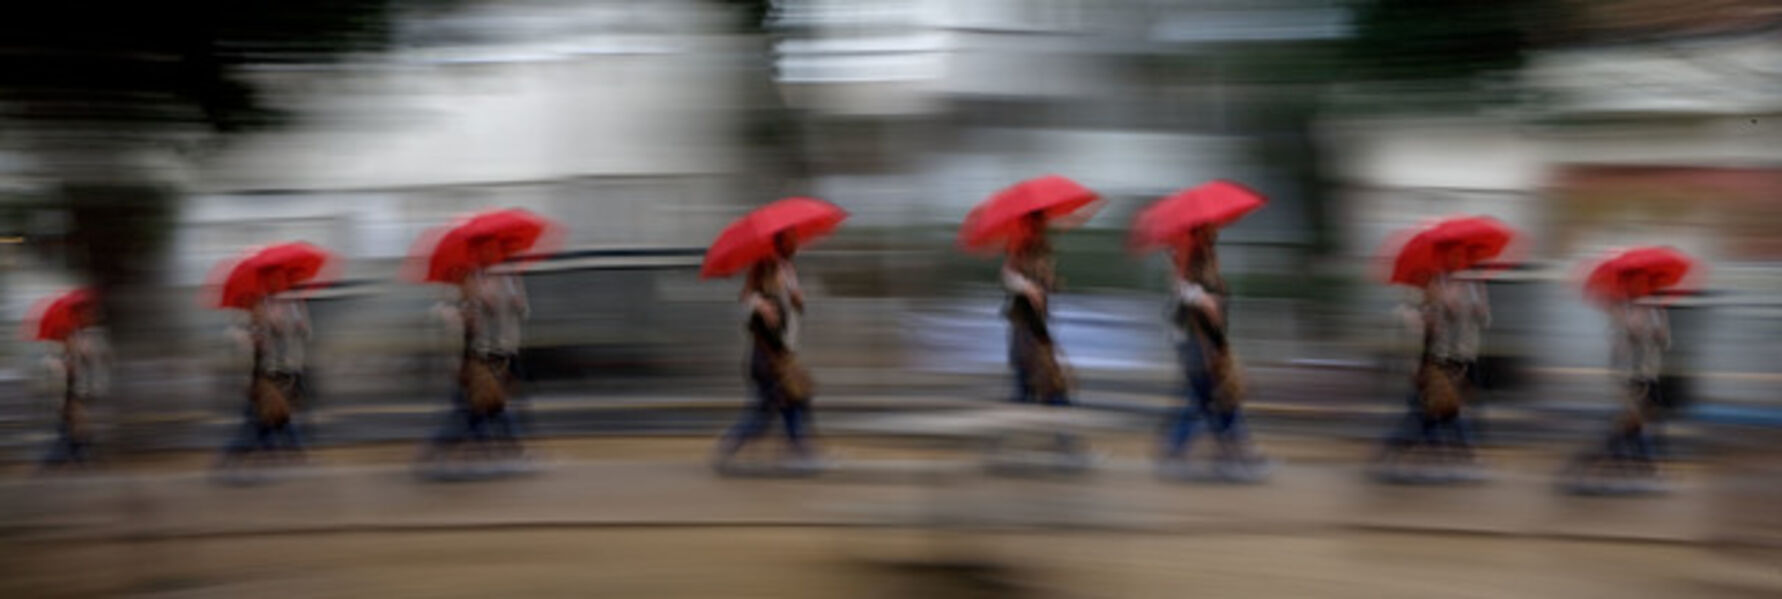 Eitan Vitkon, 'Red Umbrella', 2008